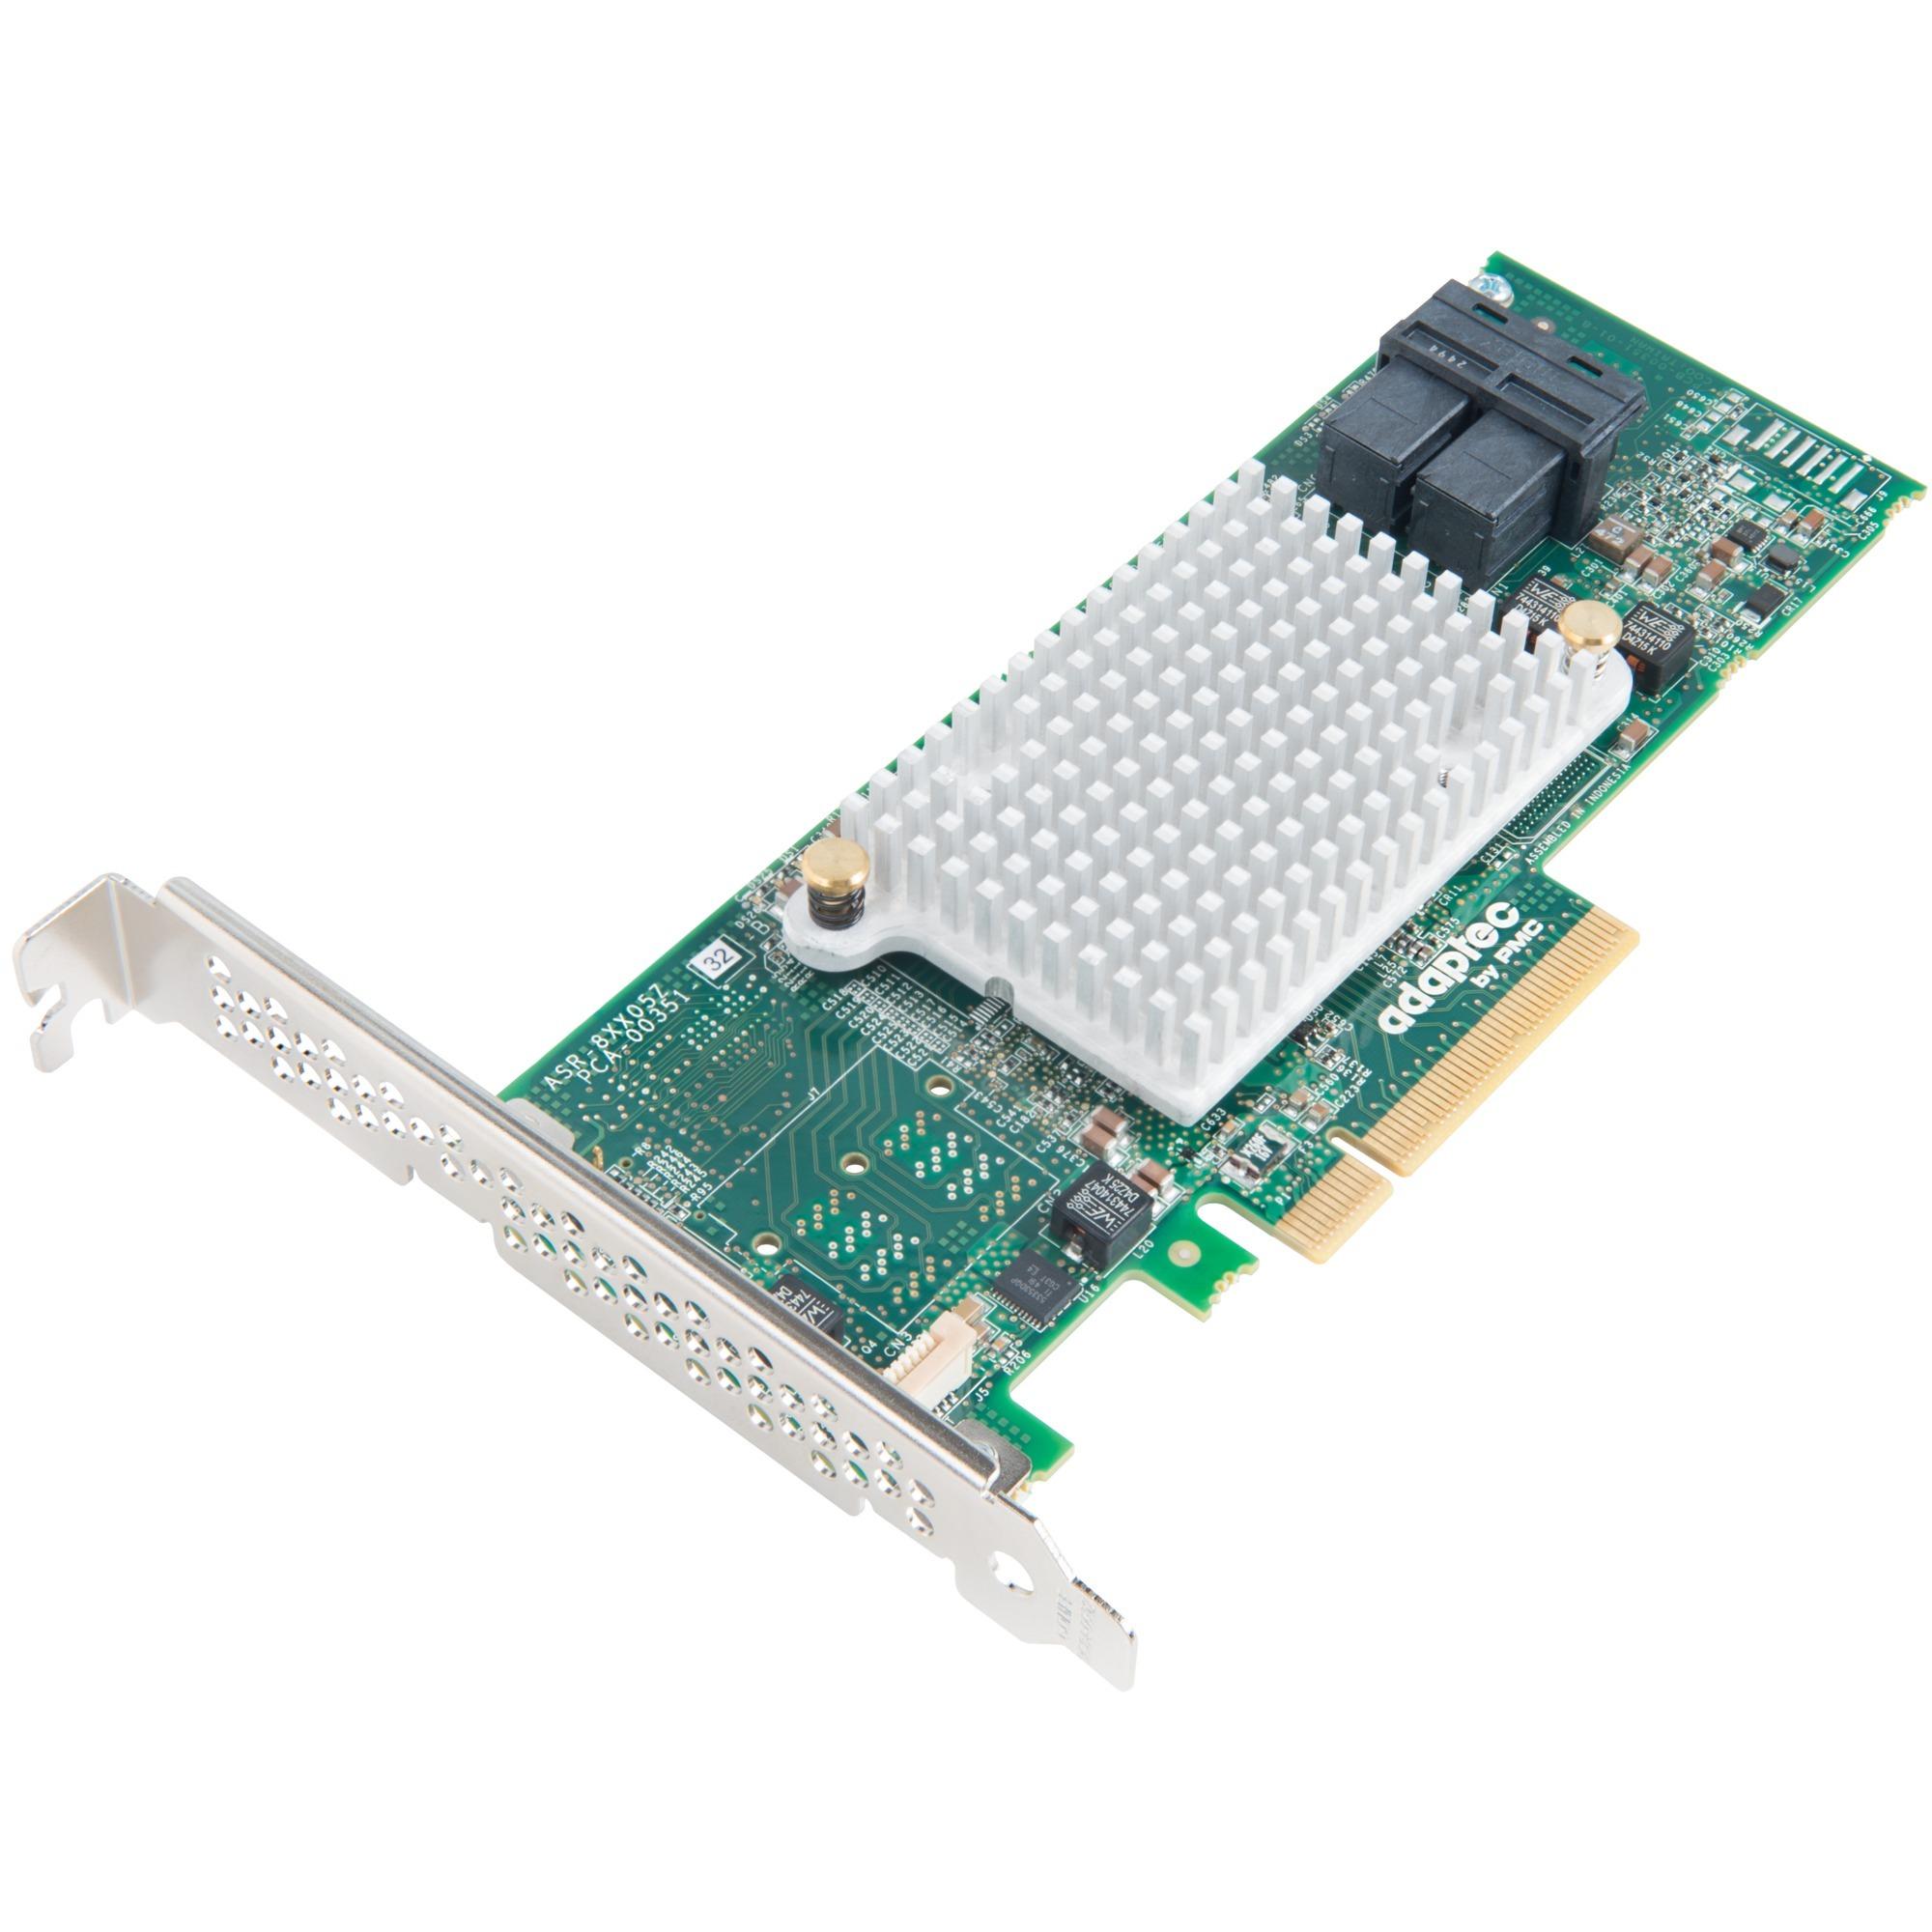 1000-8i tarjeta y adaptador de interfaz Interno mini SAS, Controlador